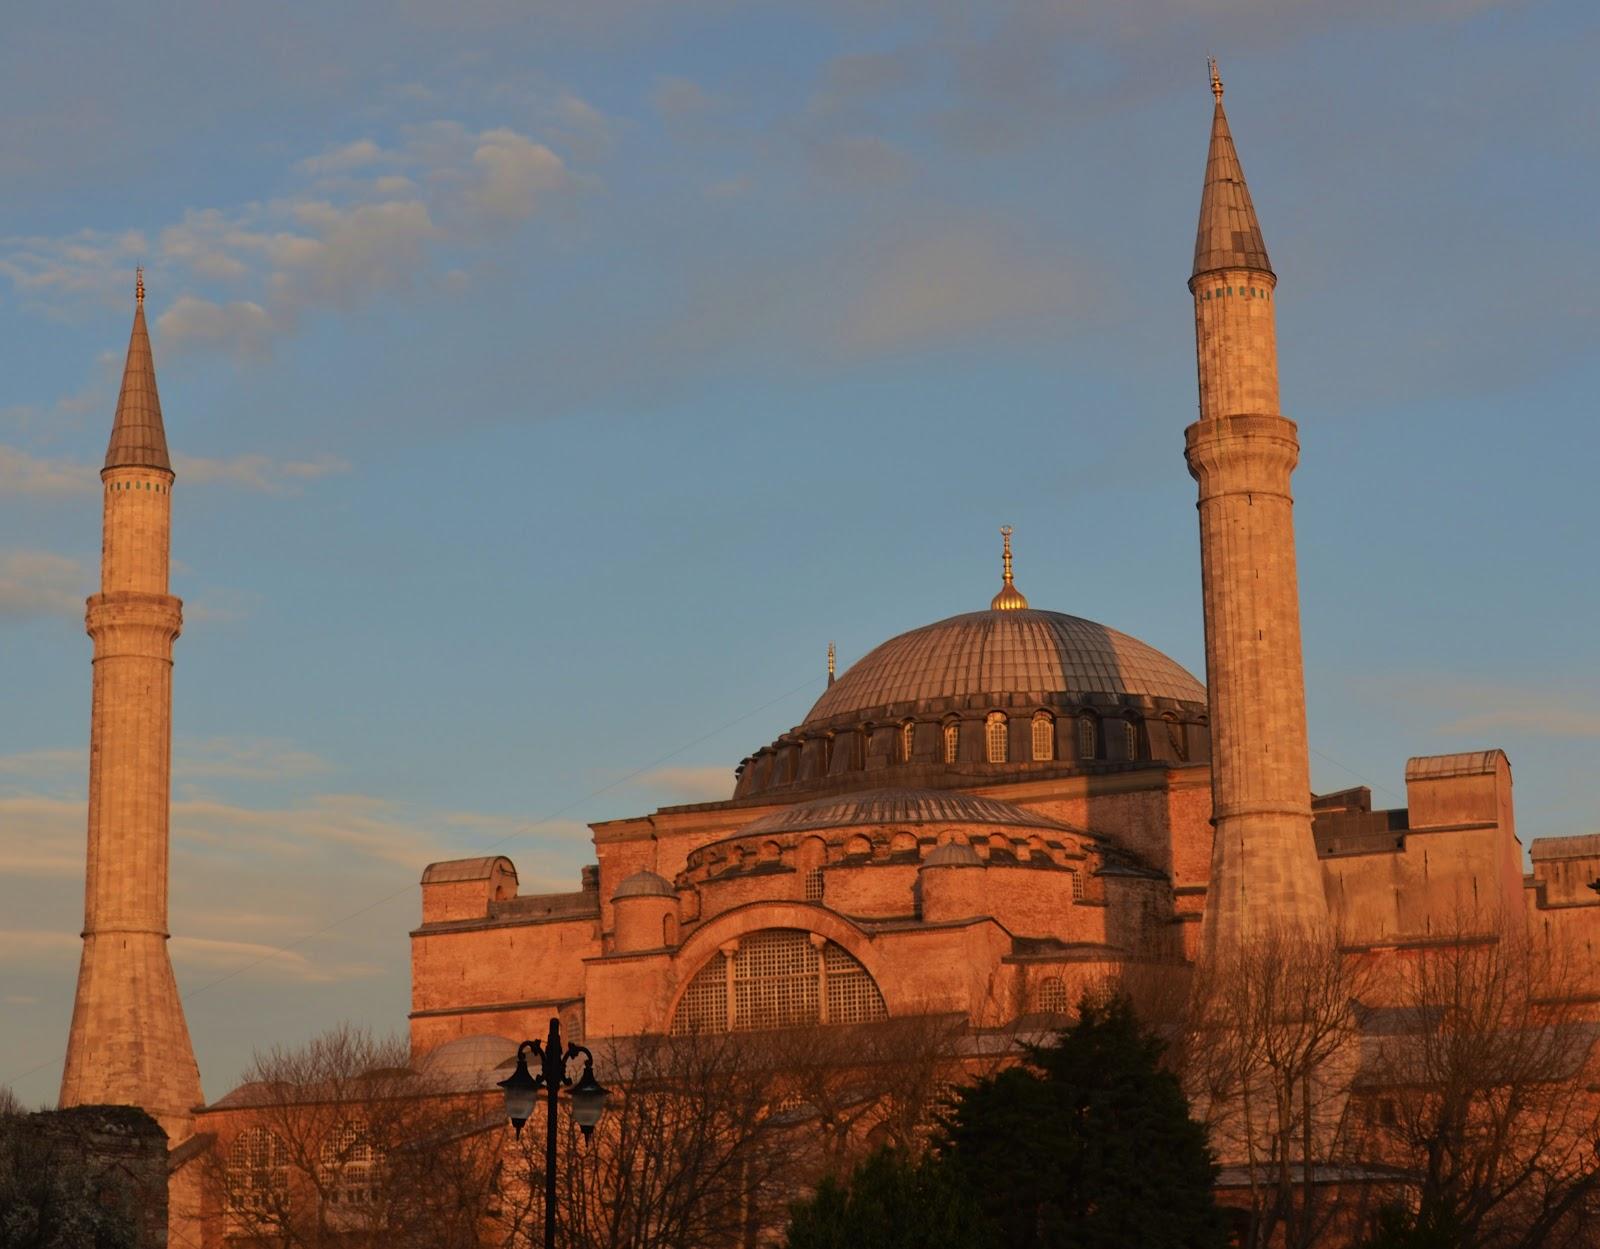 American Homestead: The Hagia Sophia